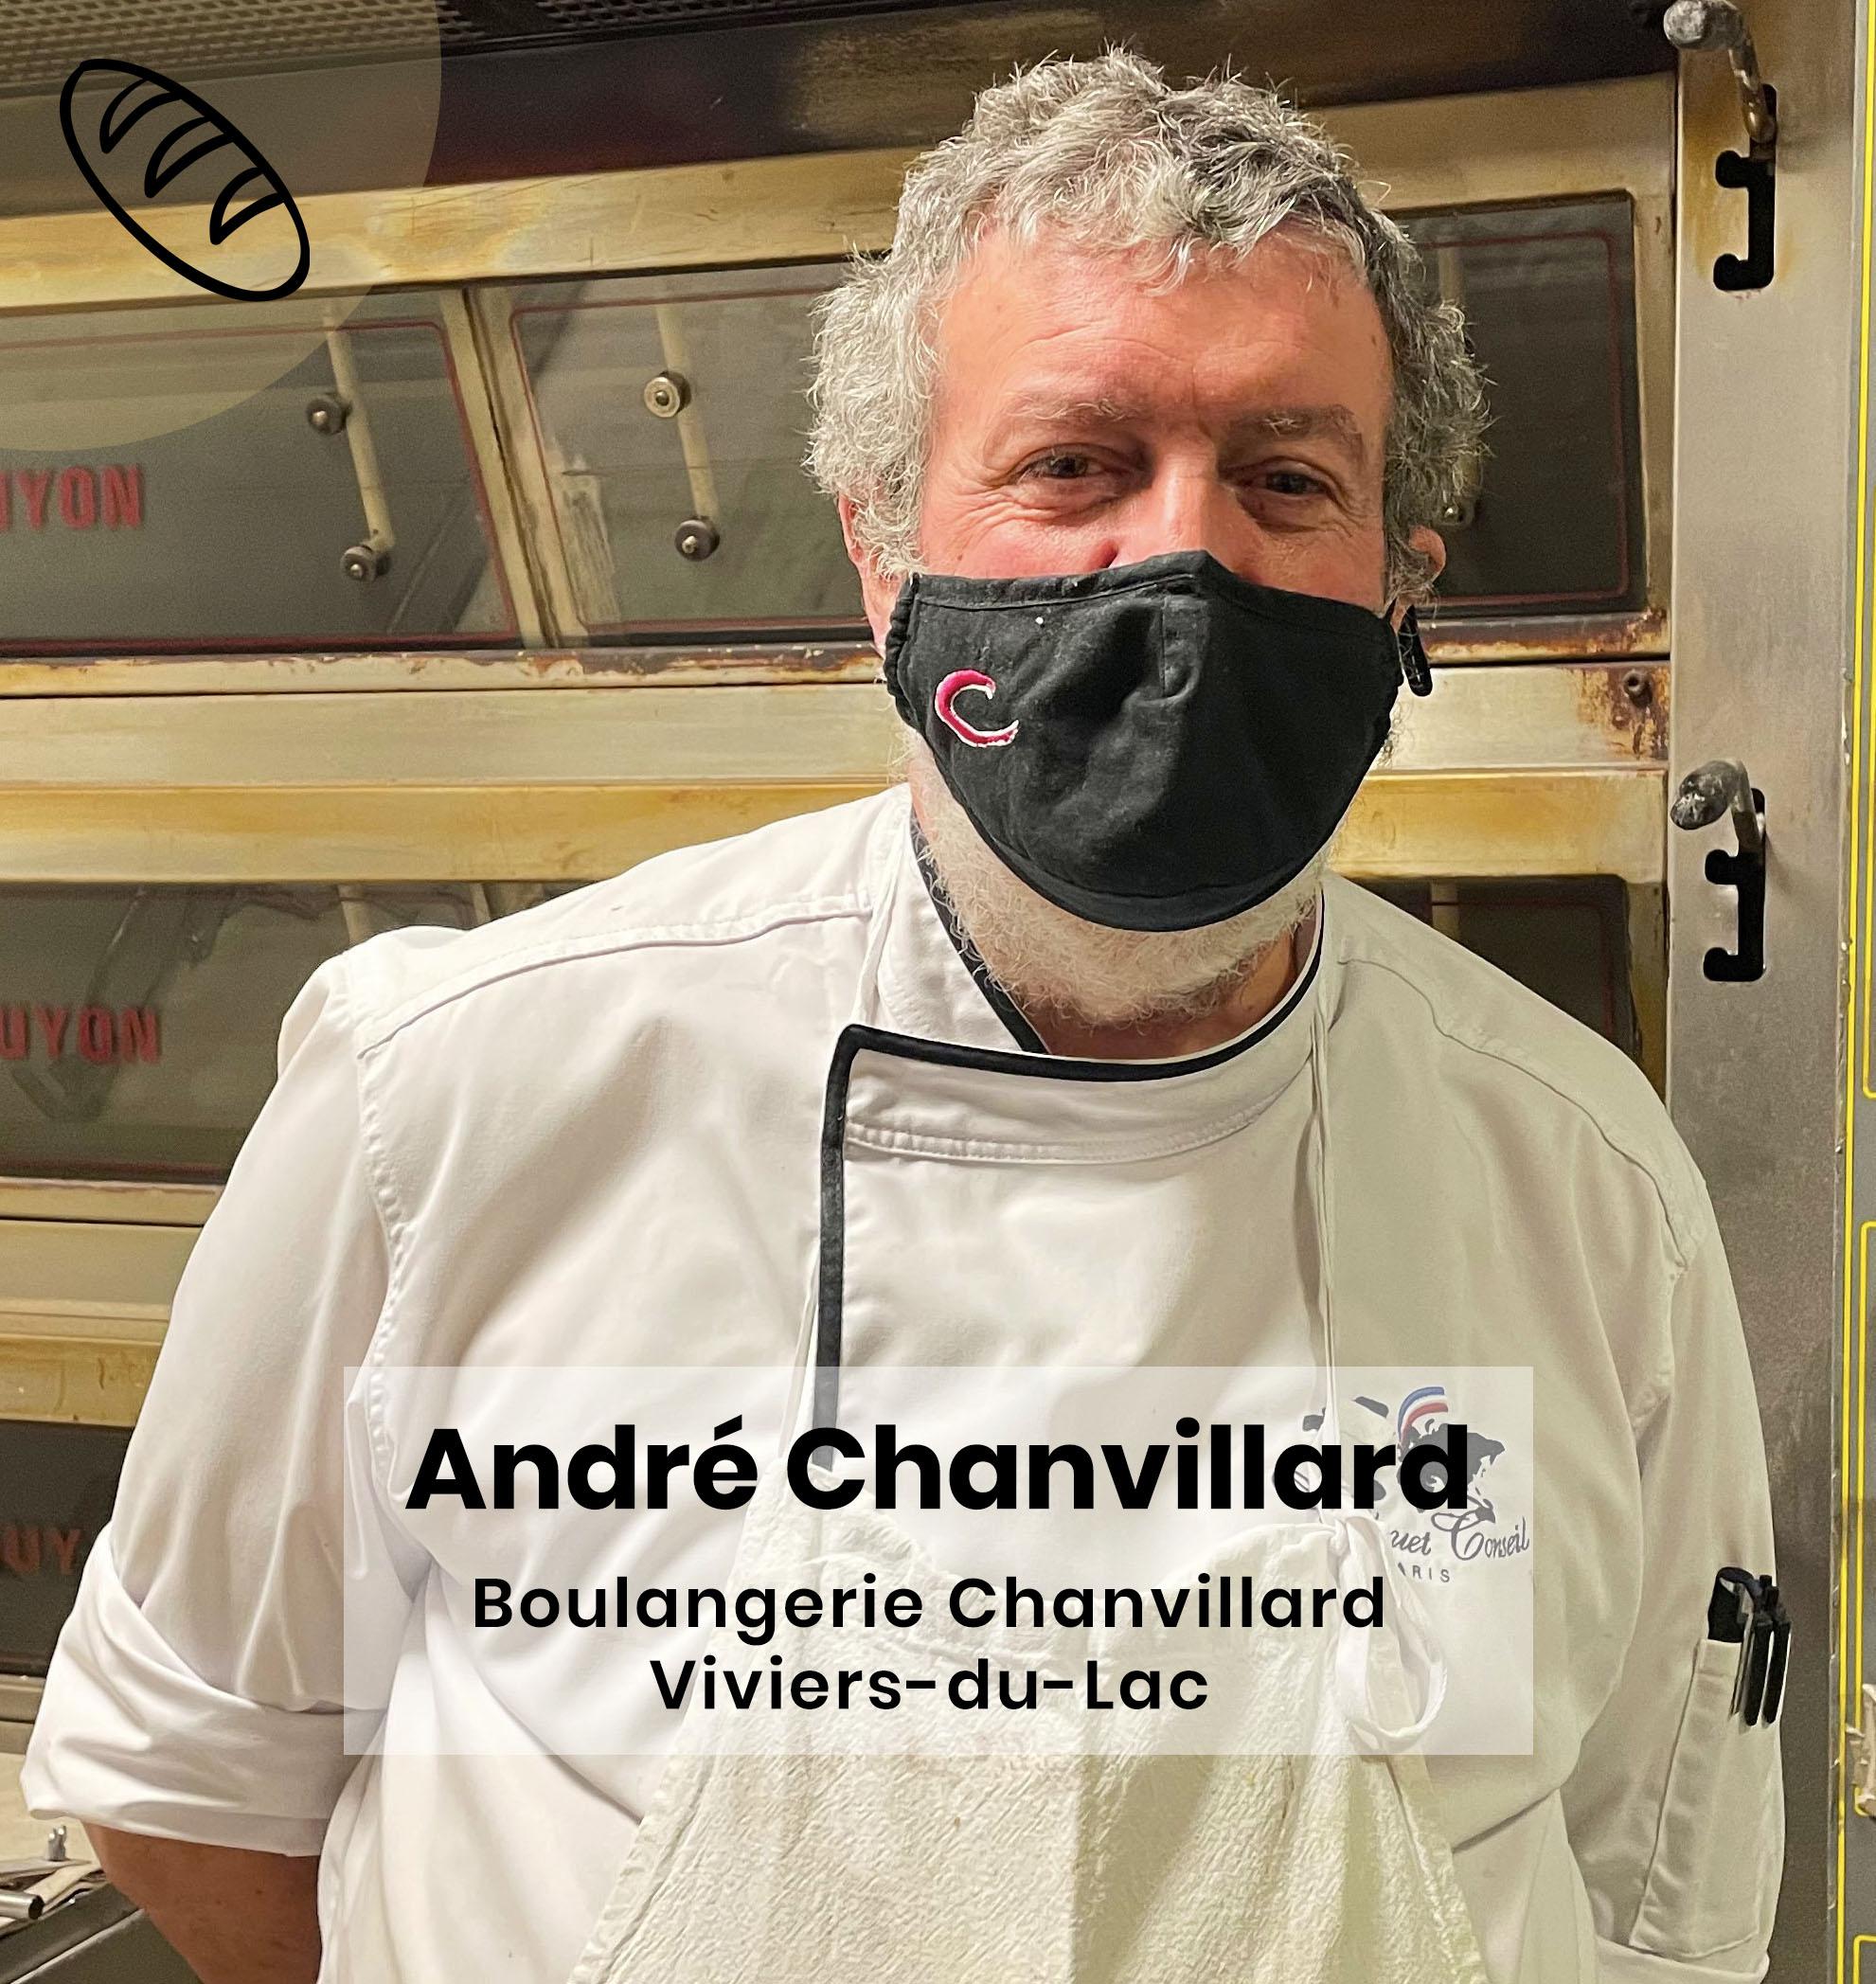 André Chanvillard, Maison Chanvillard